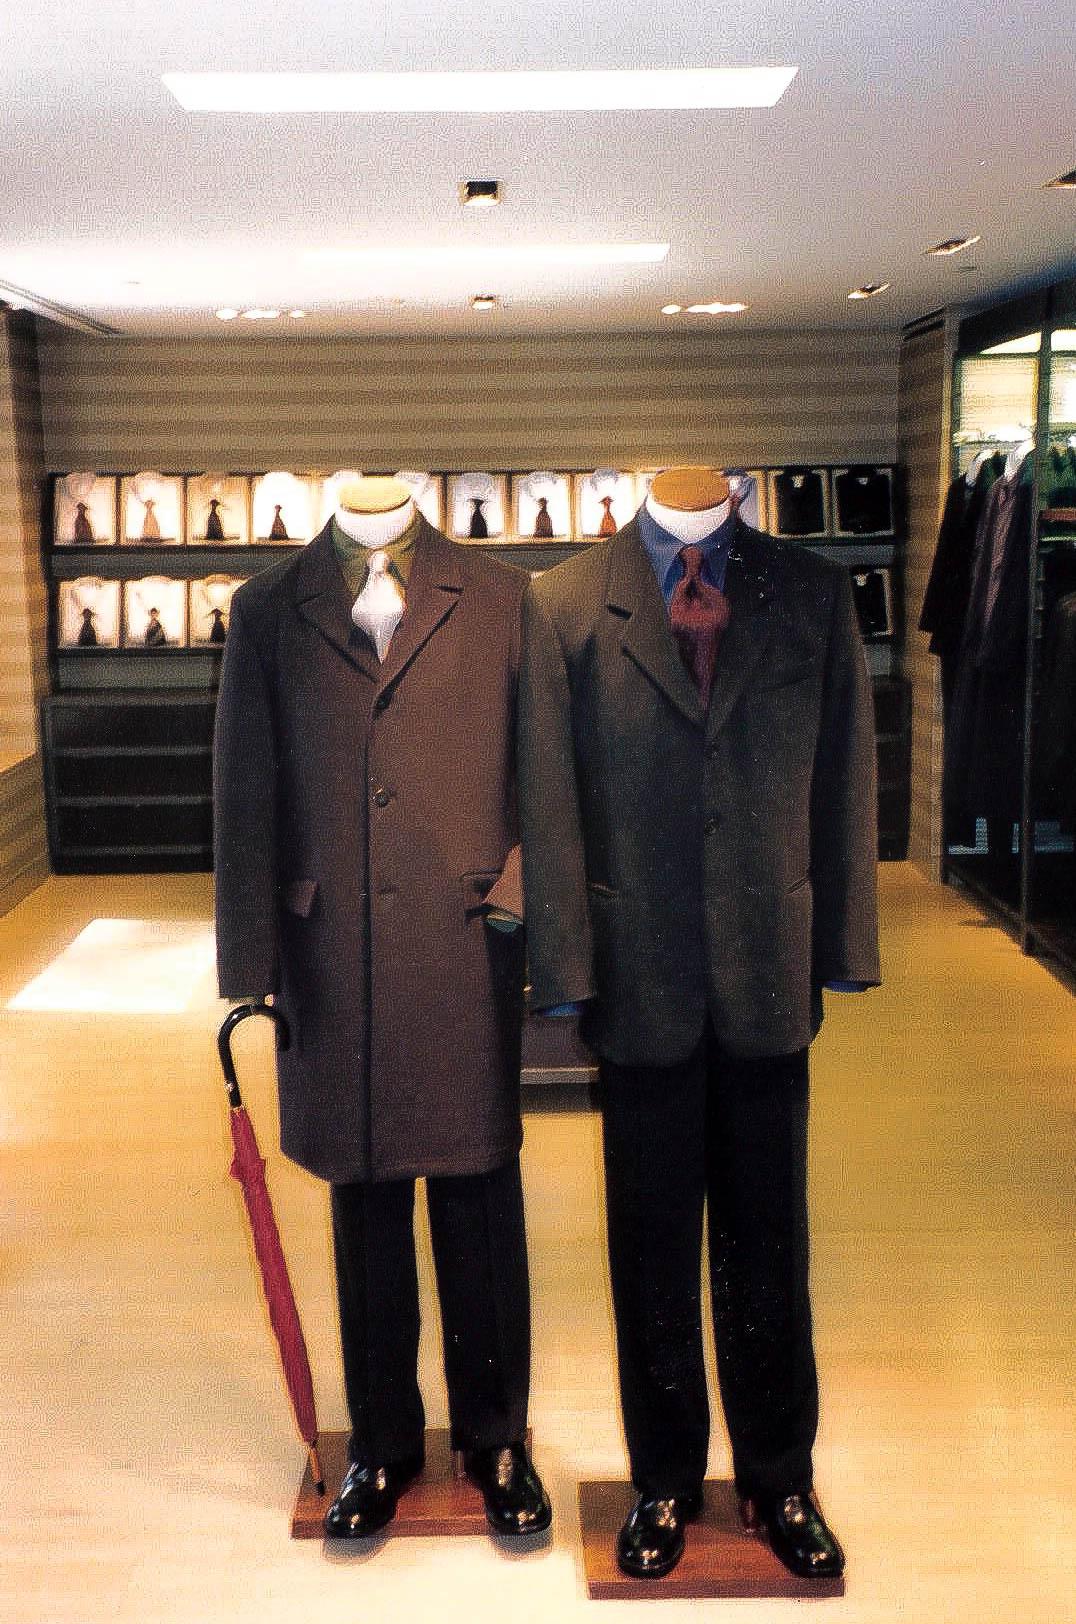 stores_12 (2).jpg